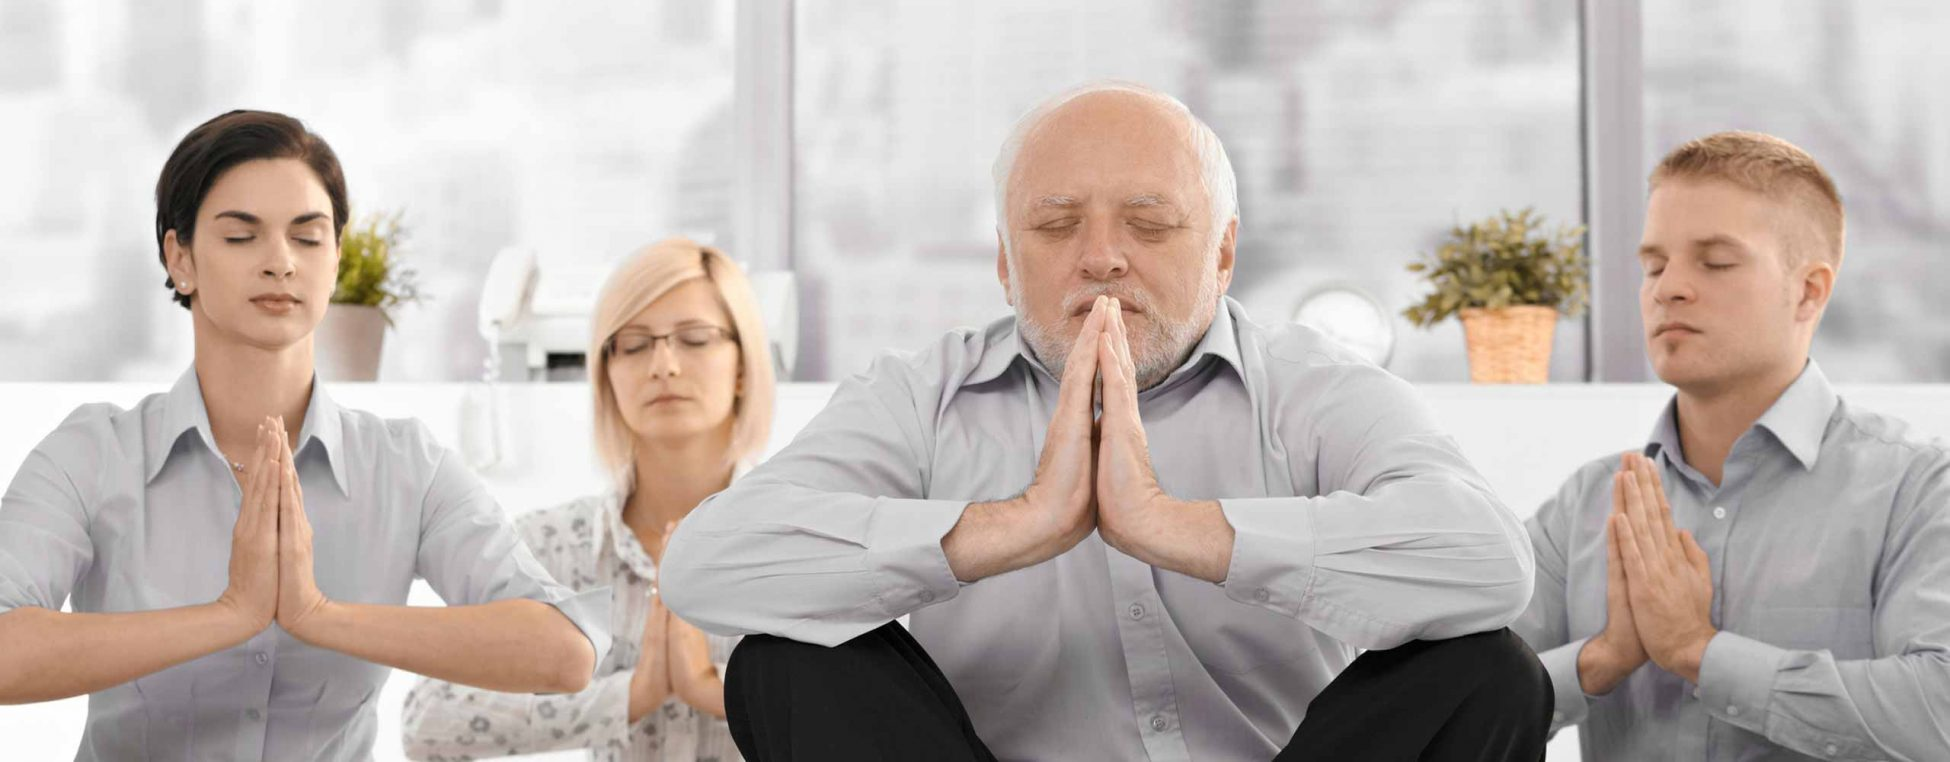 Entspannung beim Yoga